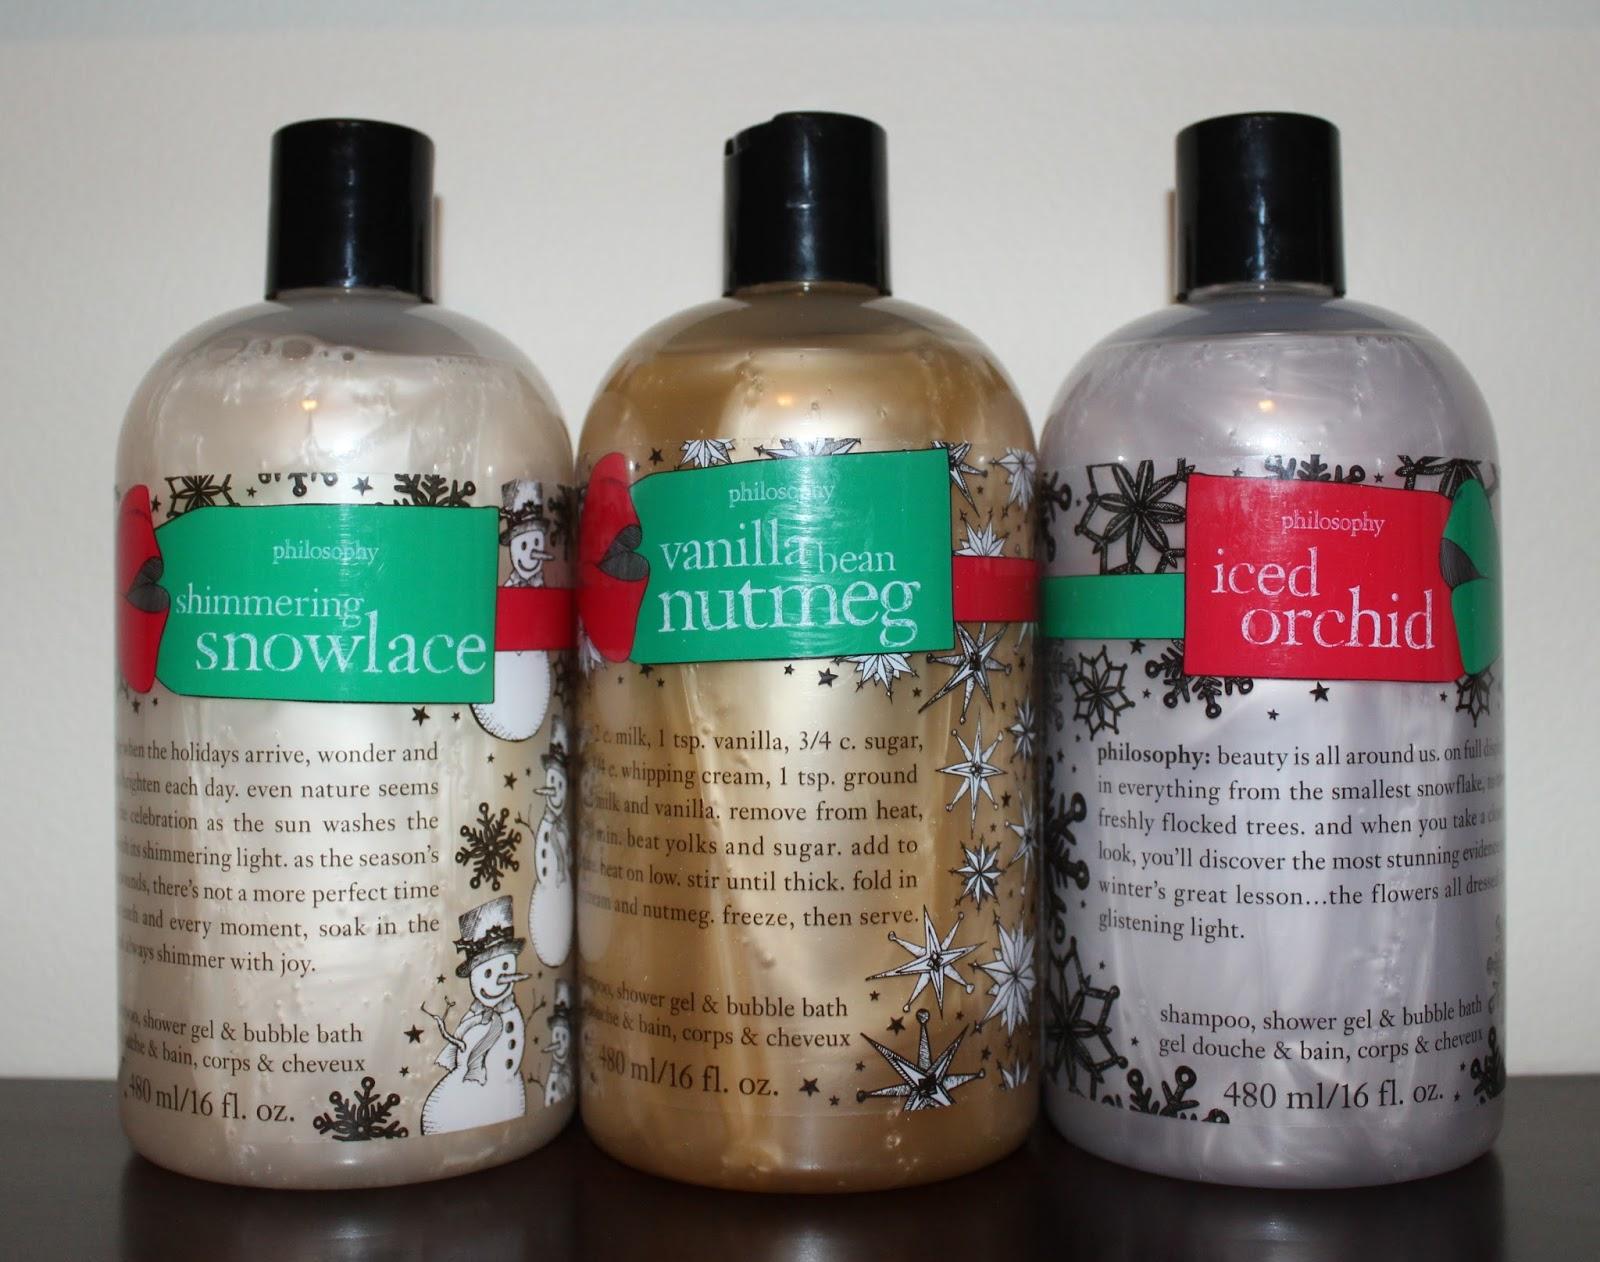 beyond blush philosophy holiday 2015 gift ideas philosophy holiday 3 in 1 shampoo shower gel bubble bath